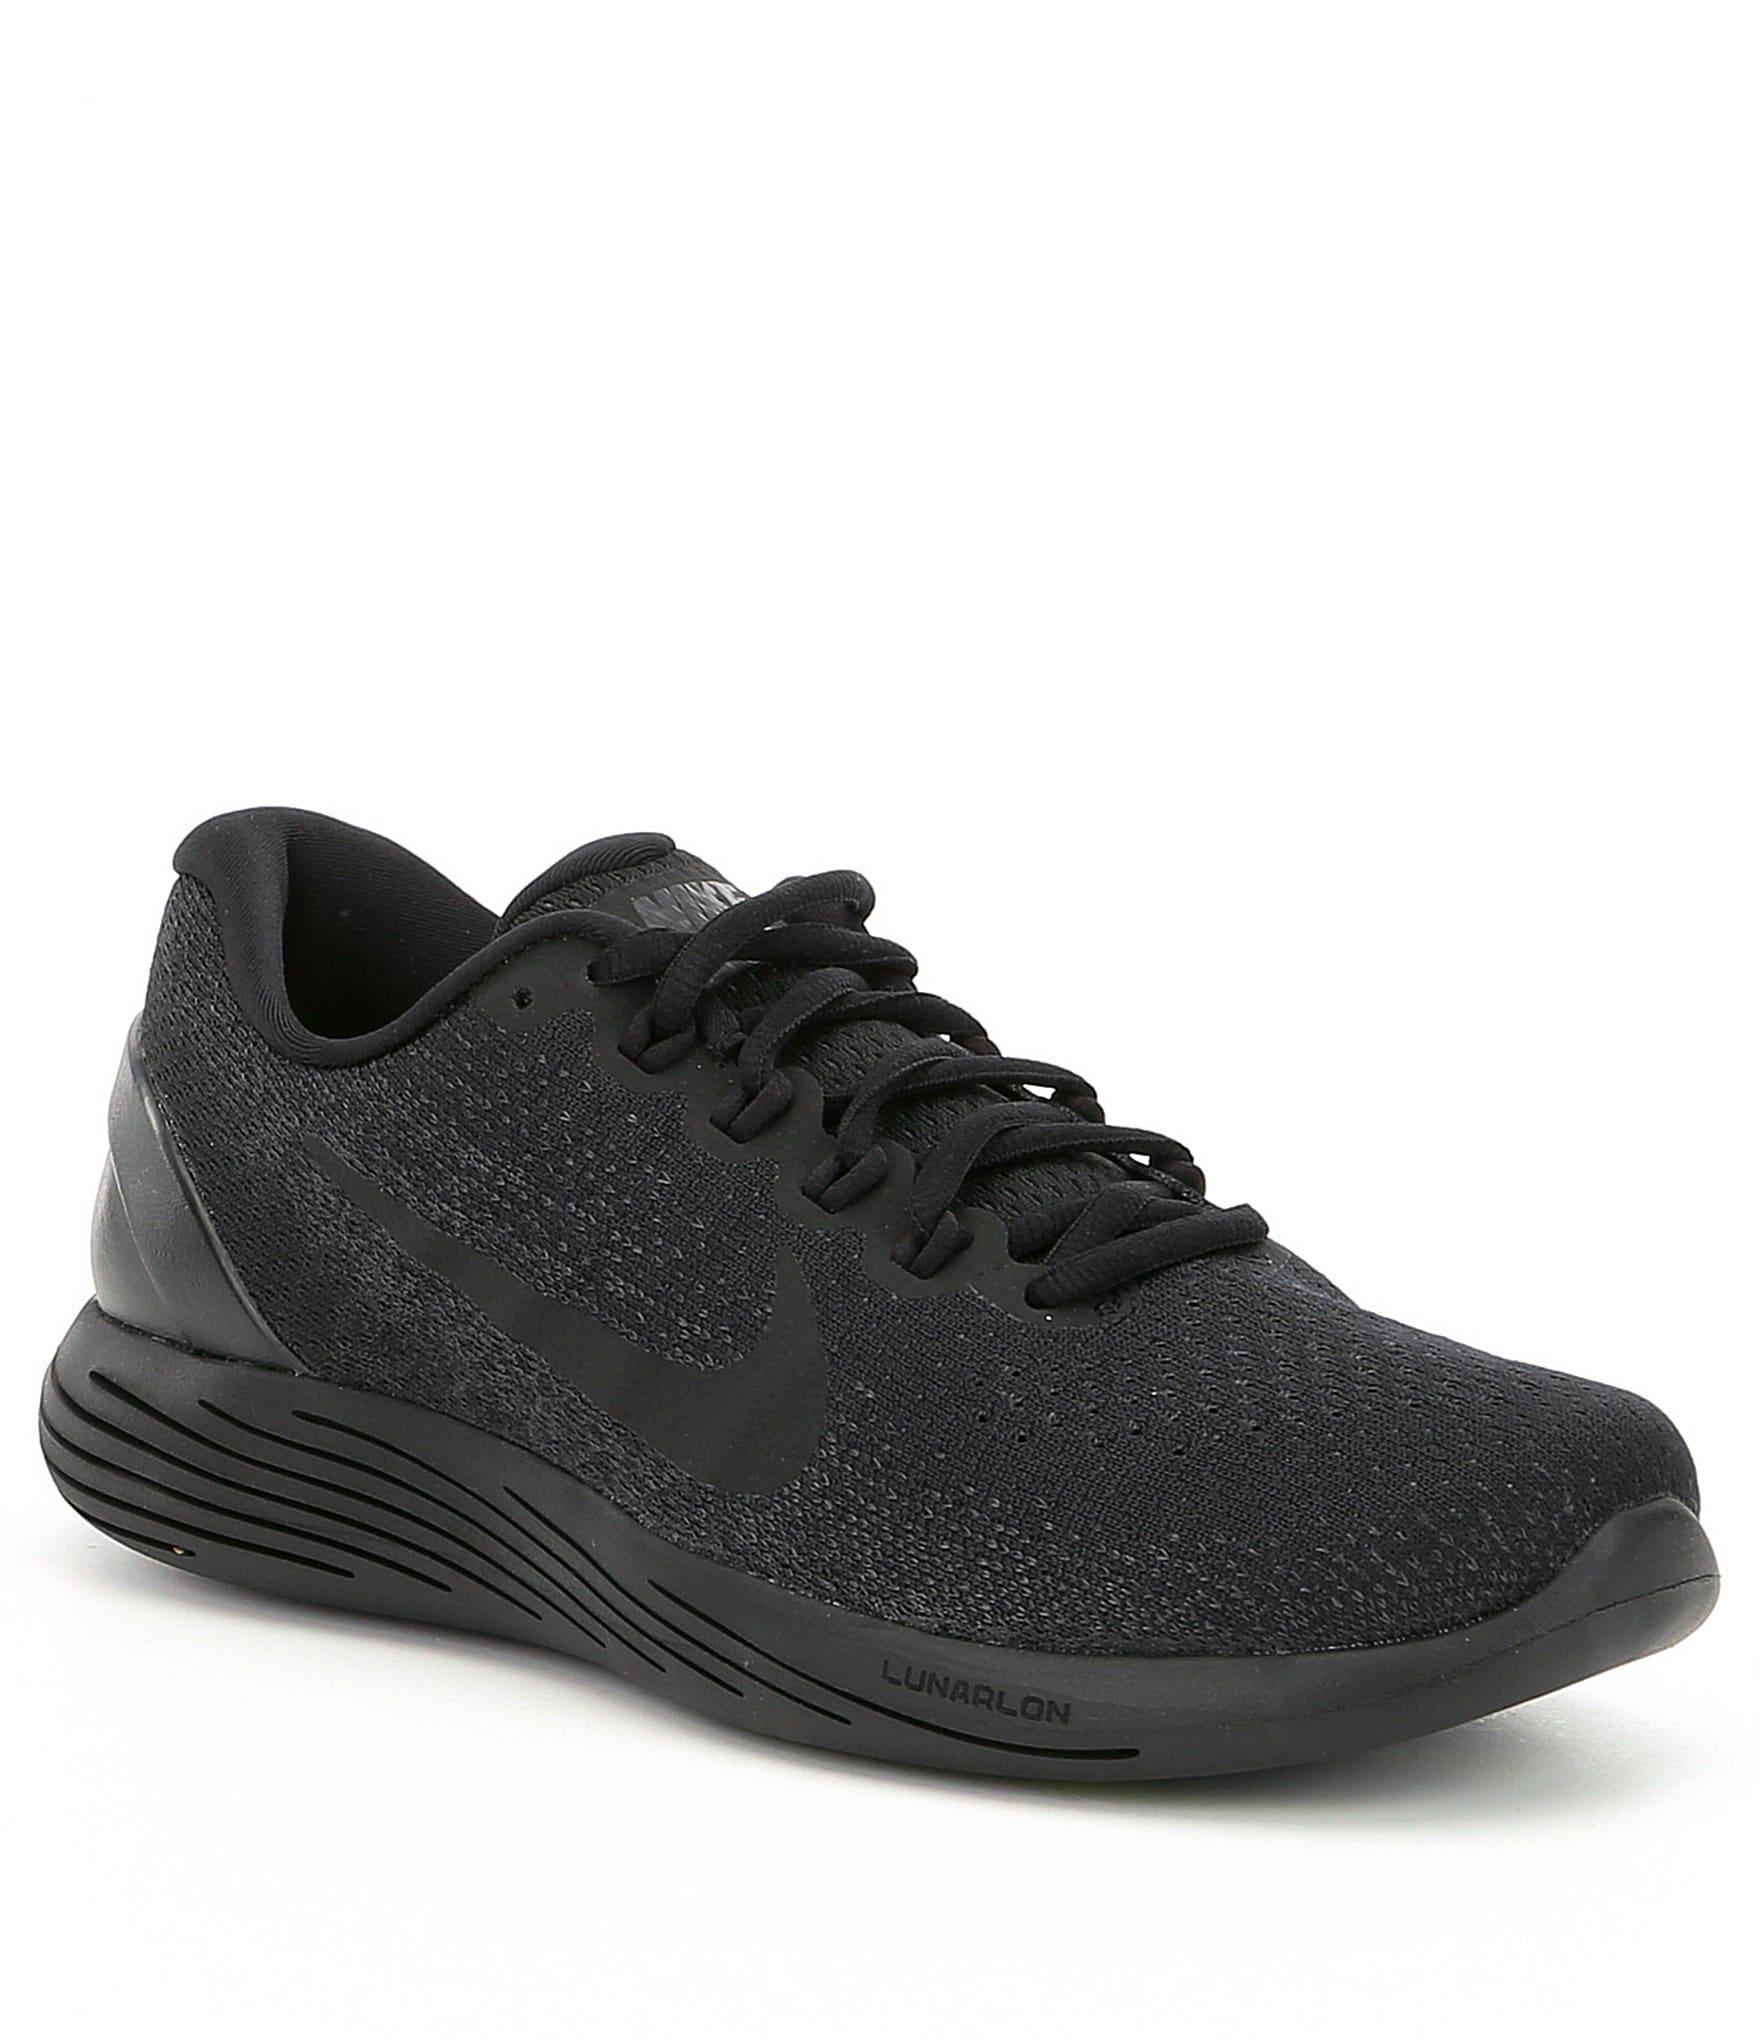 nike 180 s lunarglide 9 running shoes dillards